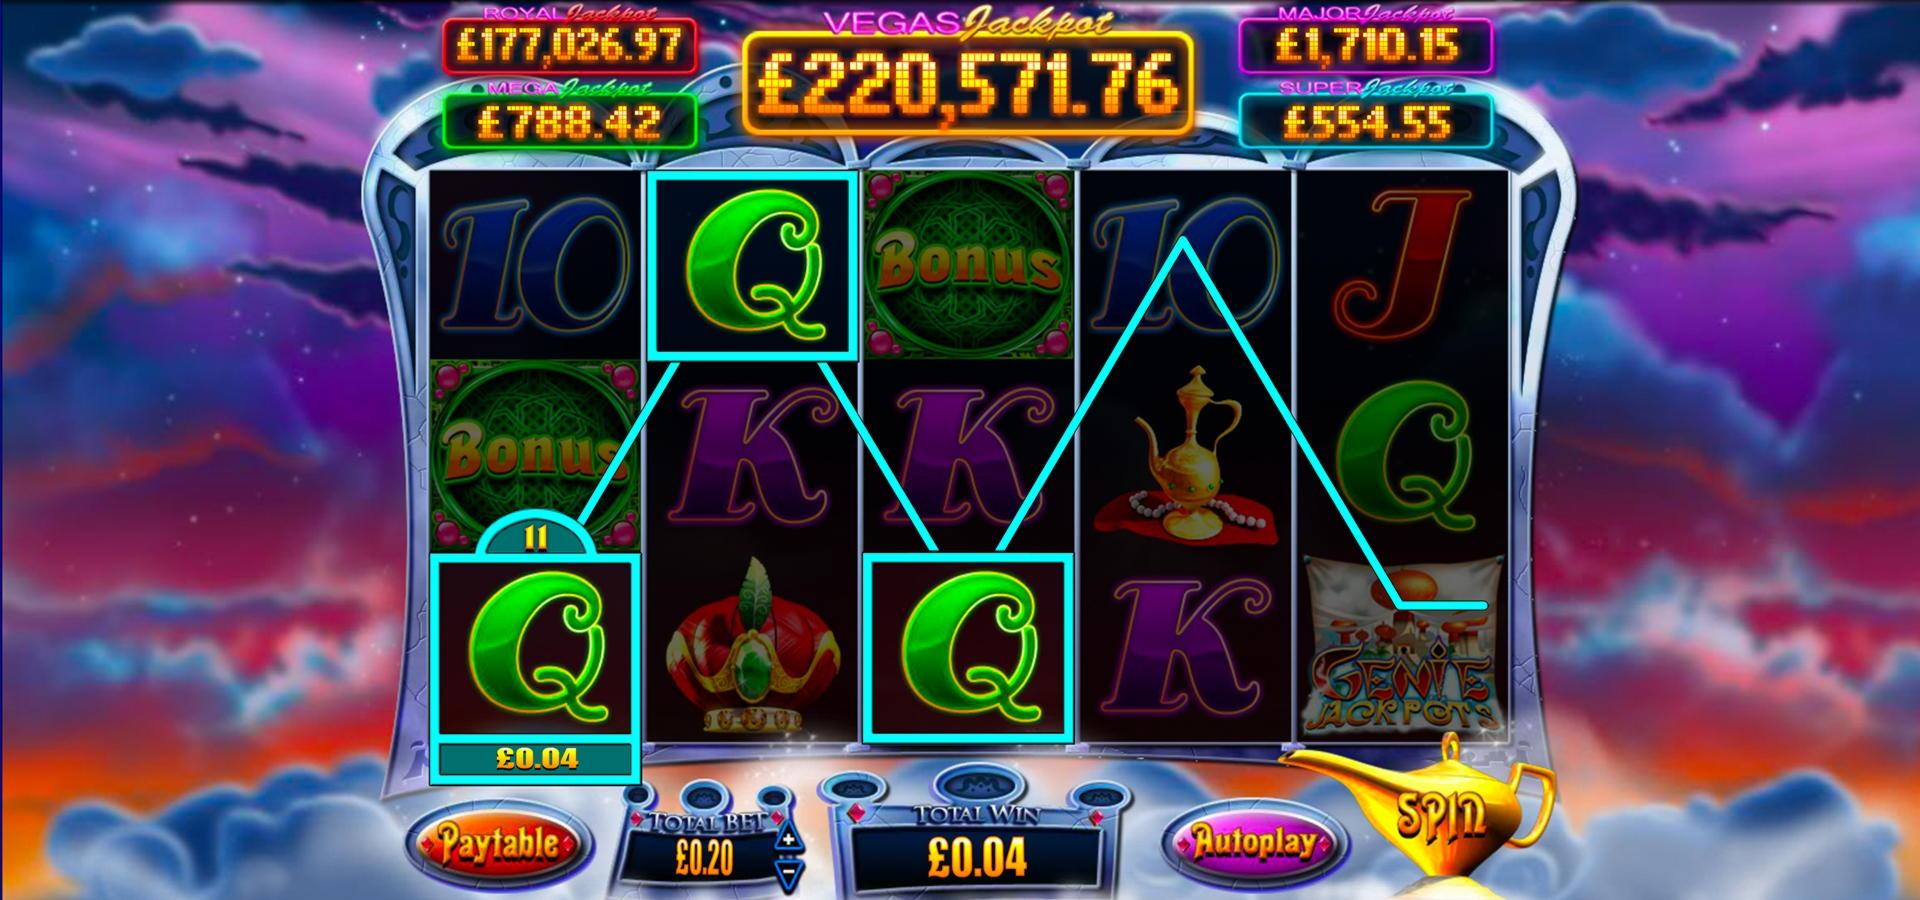 285% Tilmeld casino bonus på William Hill Casino